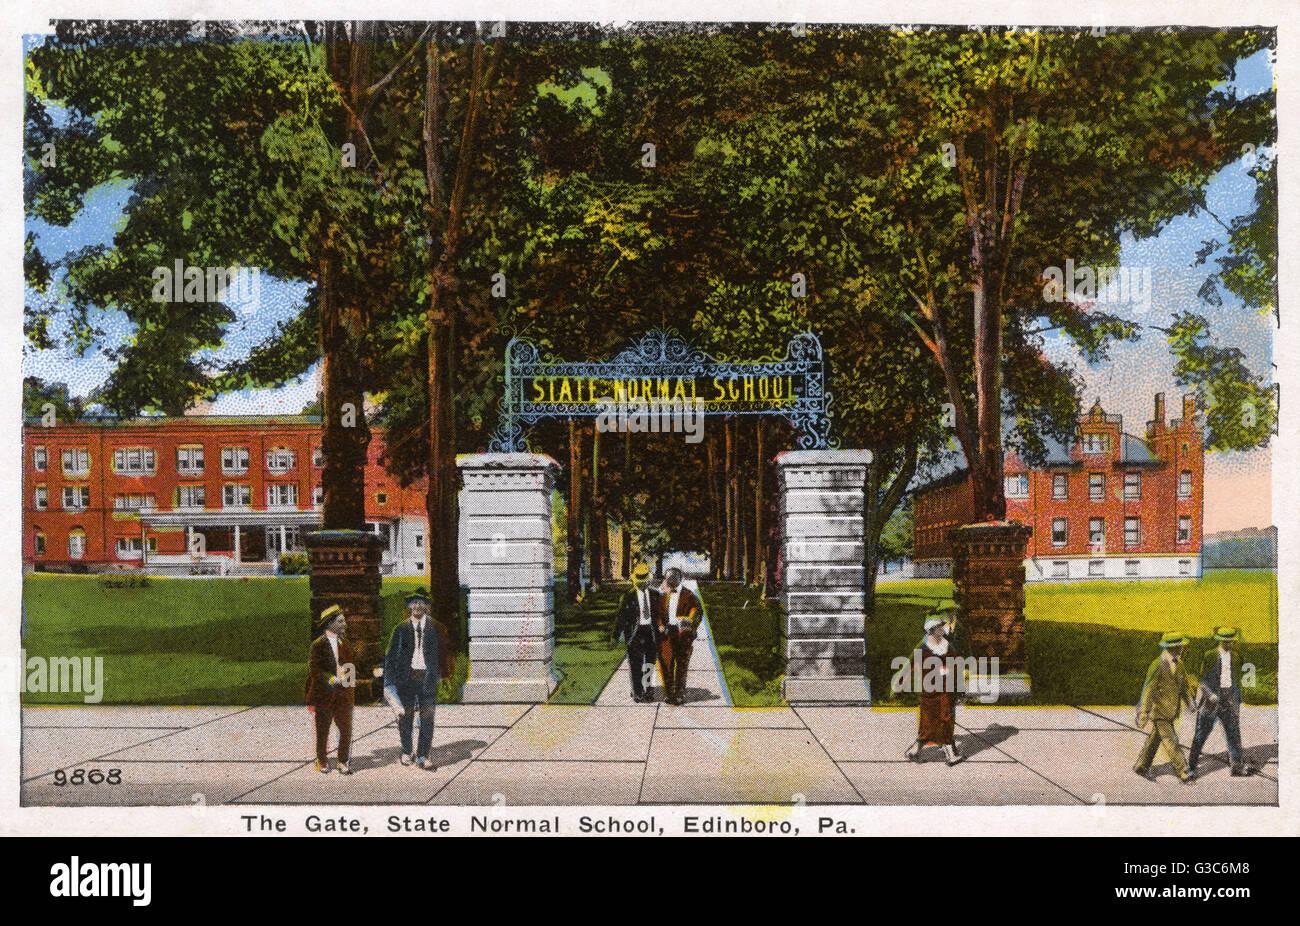 Entrance gate of the State Normal School, Edinboro, Pennsylvania, USA.      Date: circa 1910s - Stock Image